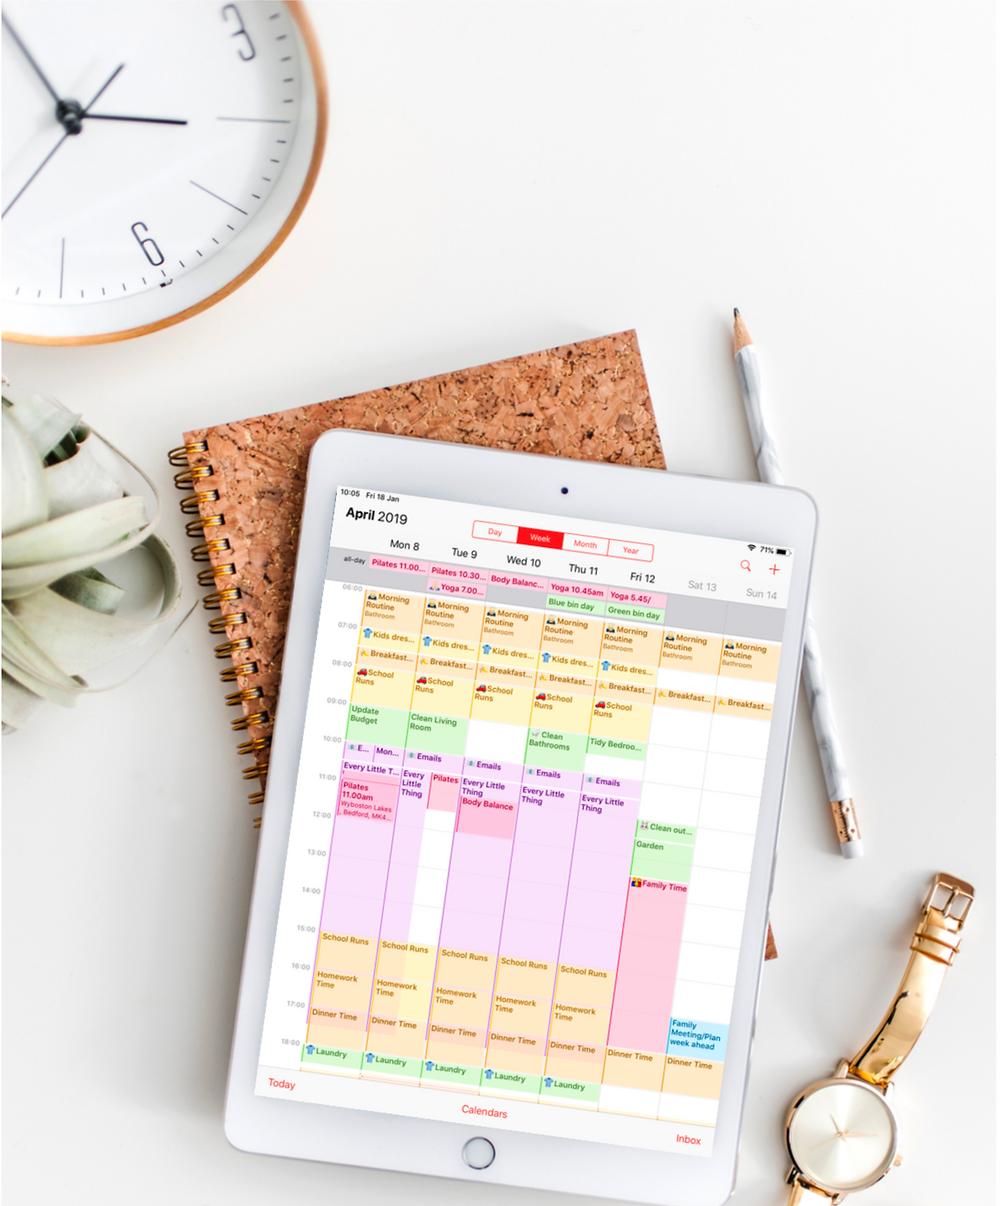 How to organise your calendar